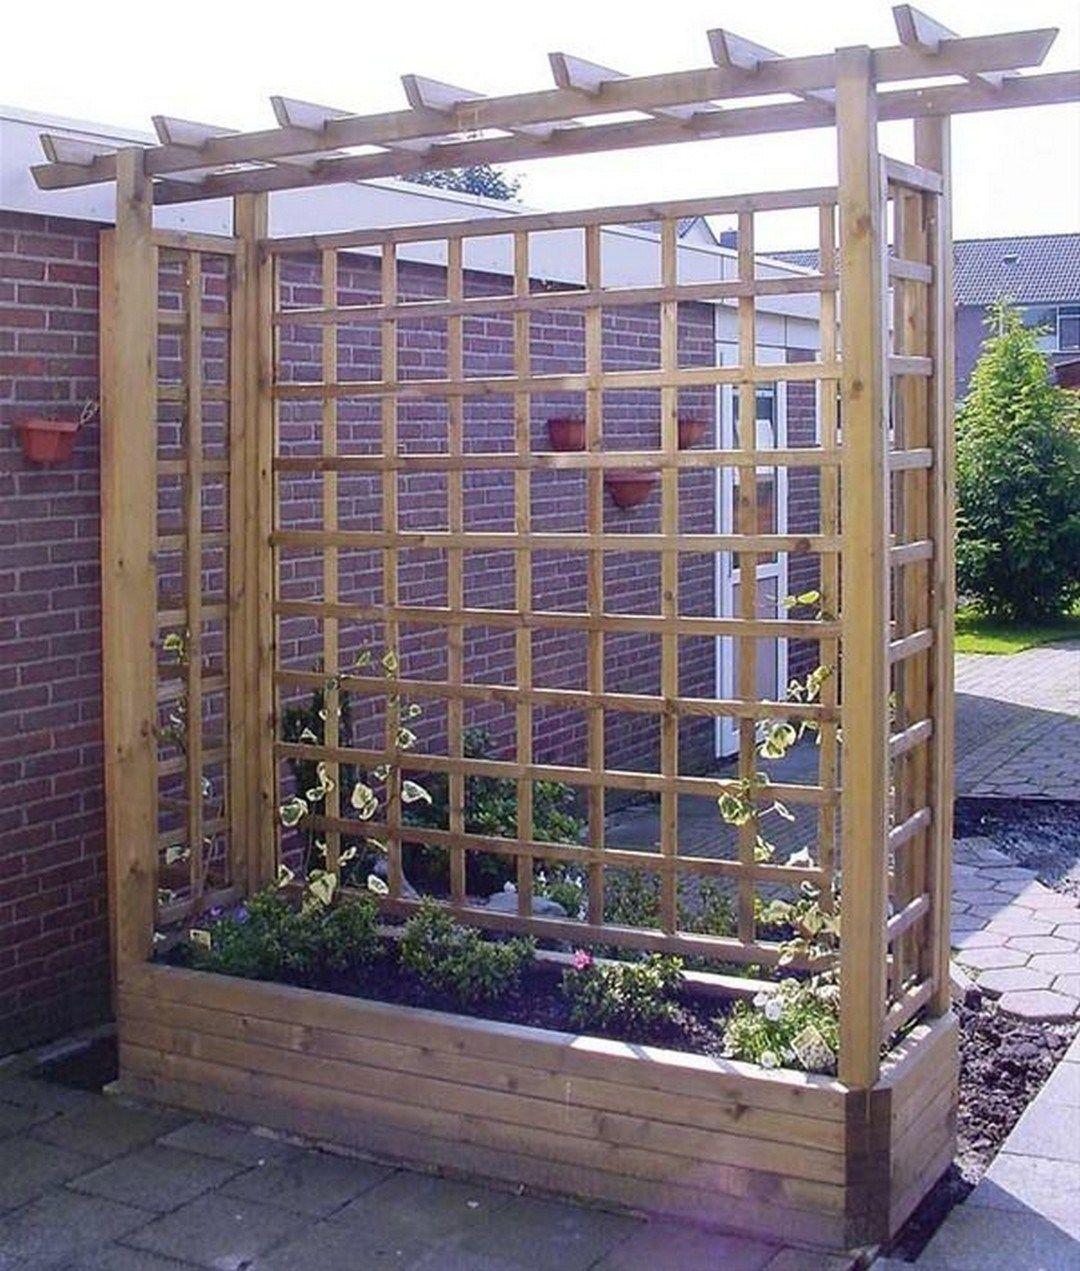 Diy Backyard Pergola Trellis Ideas To Enhance The Outdoor Life 19 Pergola Planter Pergola Garden